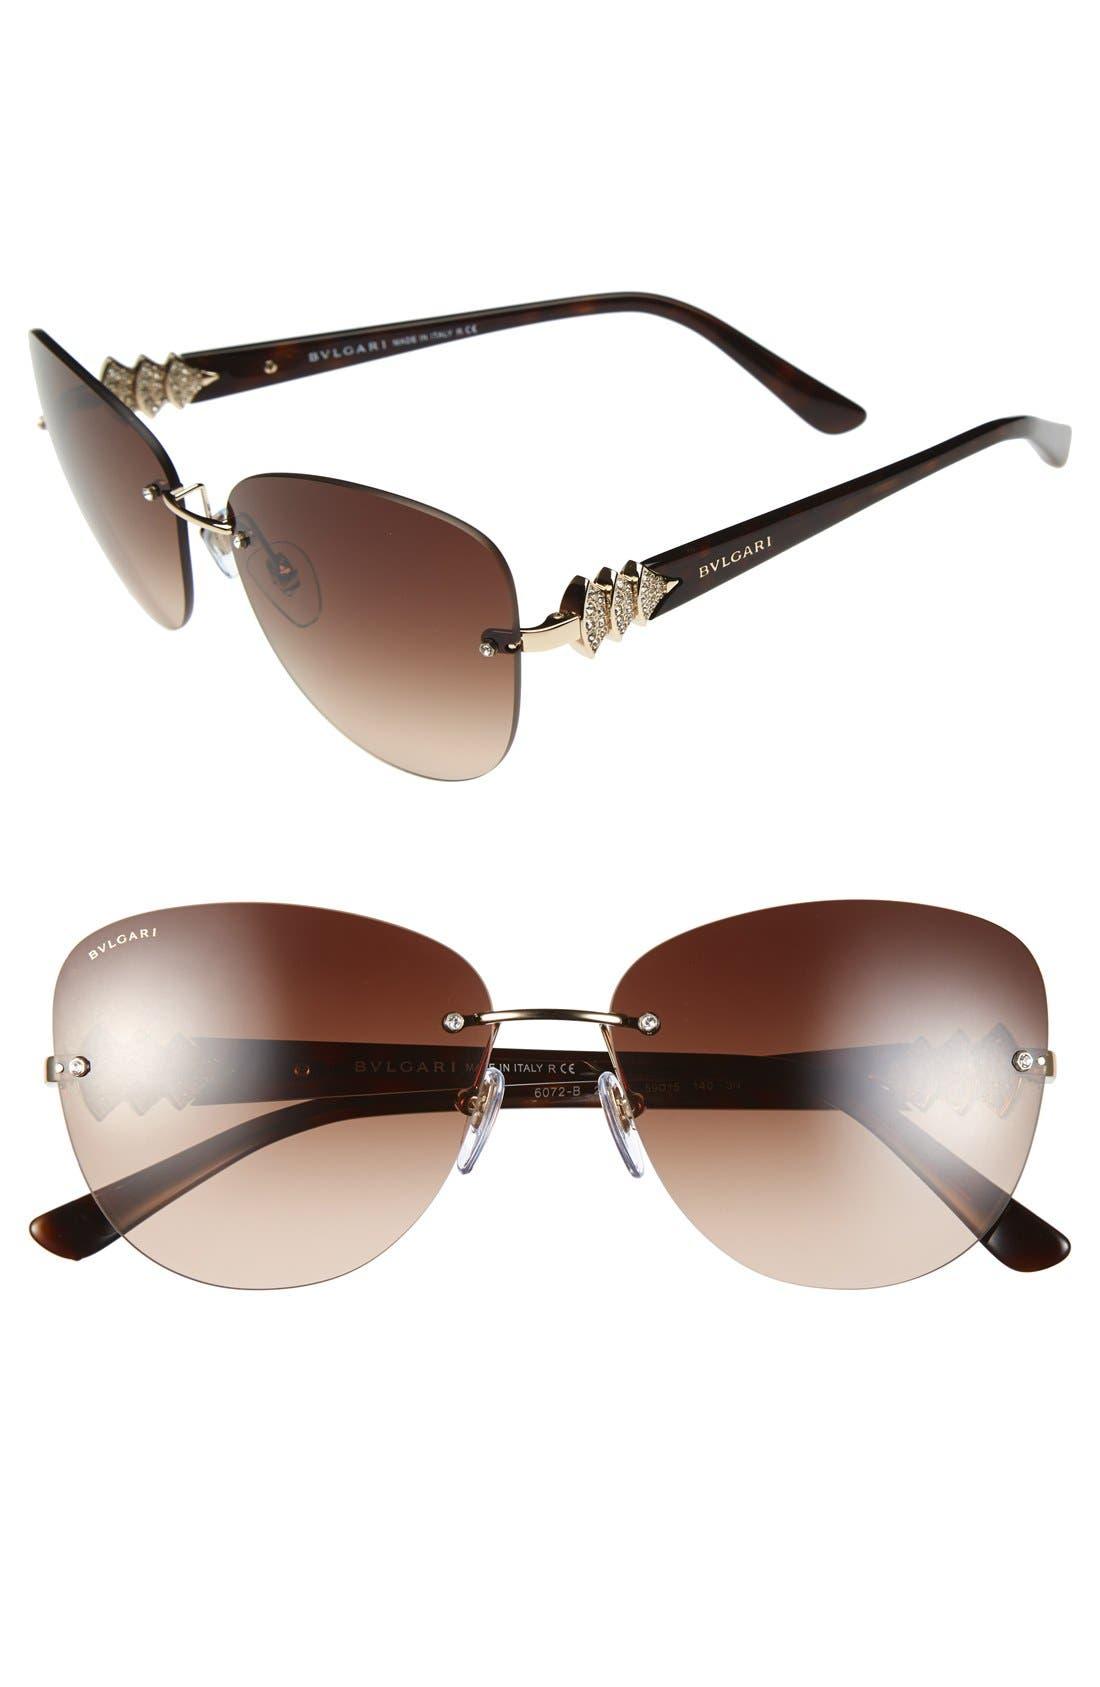 Alternate Image 1 Selected - BVLGARI 59mm Rimless Aviator Sunglasses